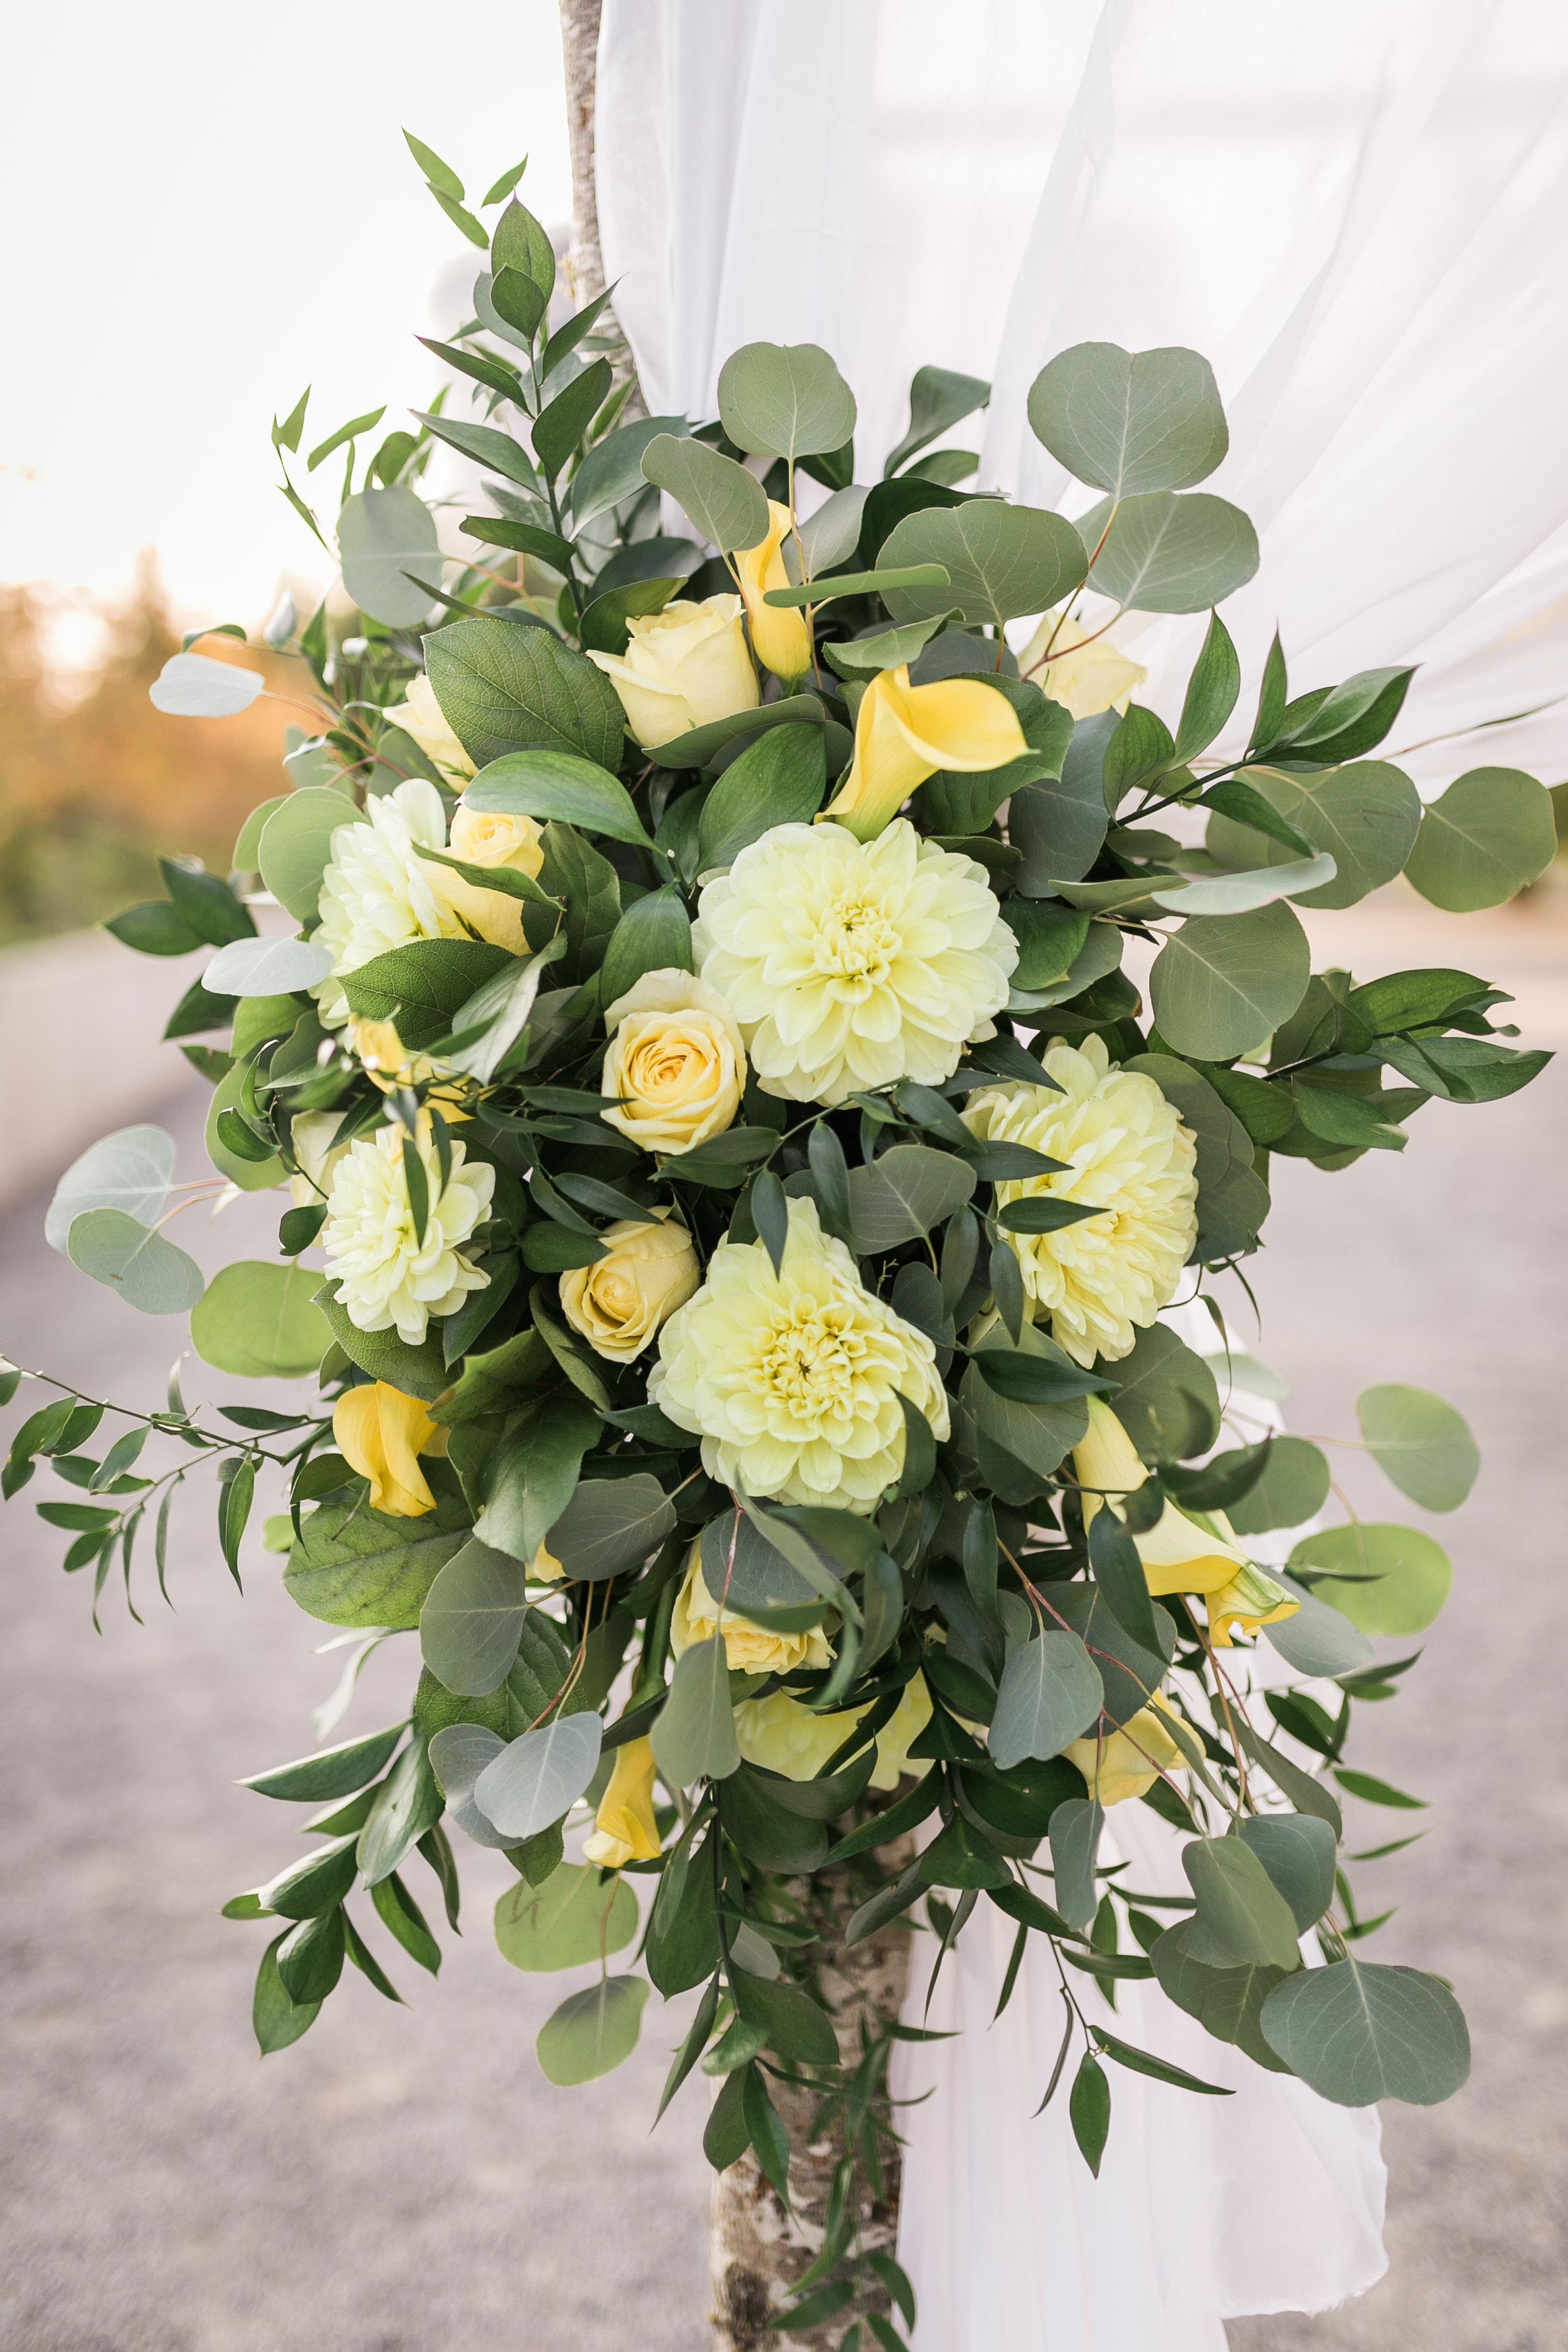 seattle-wedding-chuppah-greenery-yellow-floral-lush-northwest